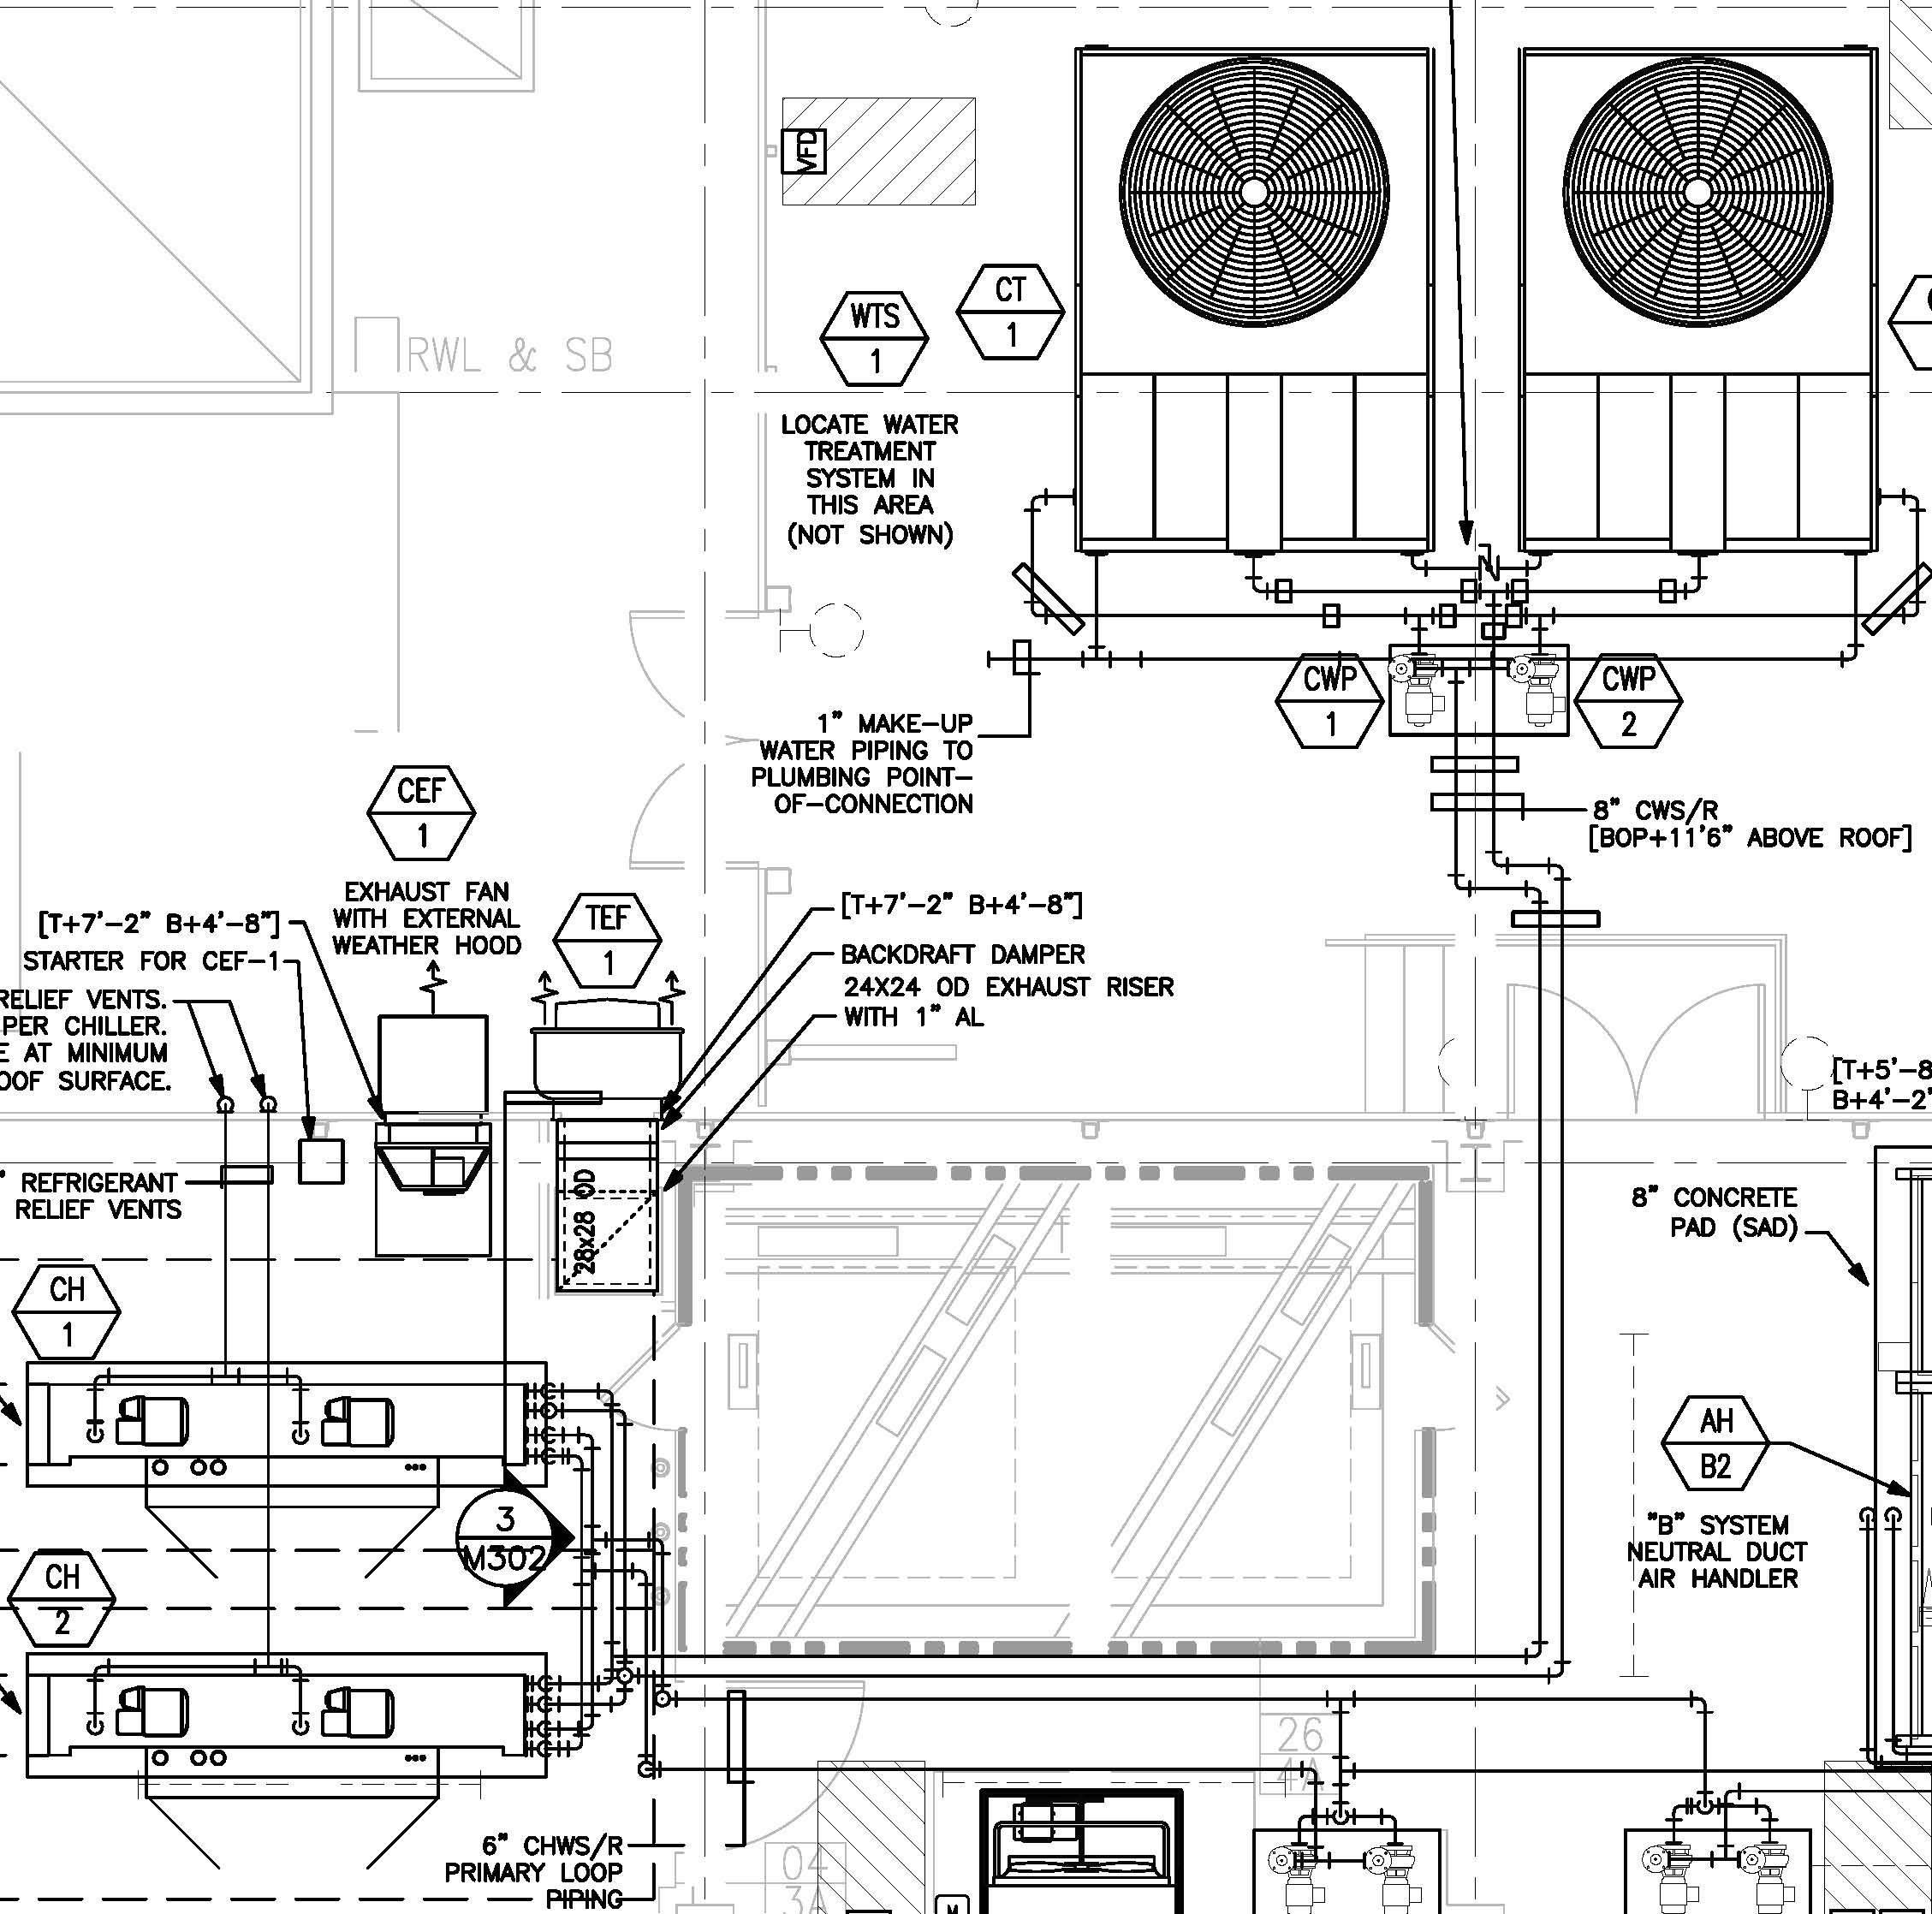 Isuzu Trooper Engine Diagram Xy Alternator Wiring Diagram Best isuzu Trooper Wiring Diagram